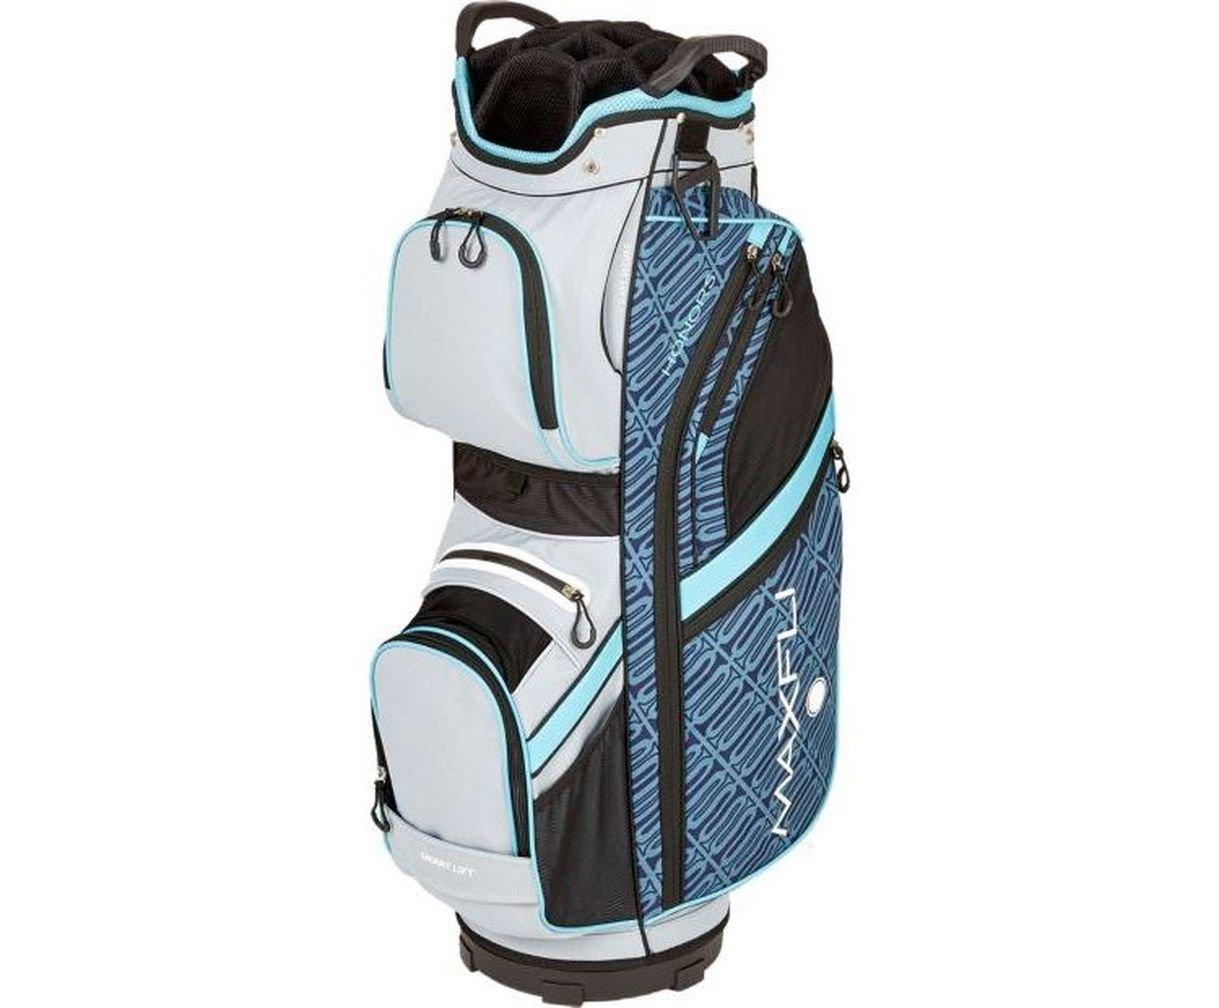 Maxfli Women's 2018 Cart Golf Bag - 14 Way - 10 Pockets - Teal/Gray/Black